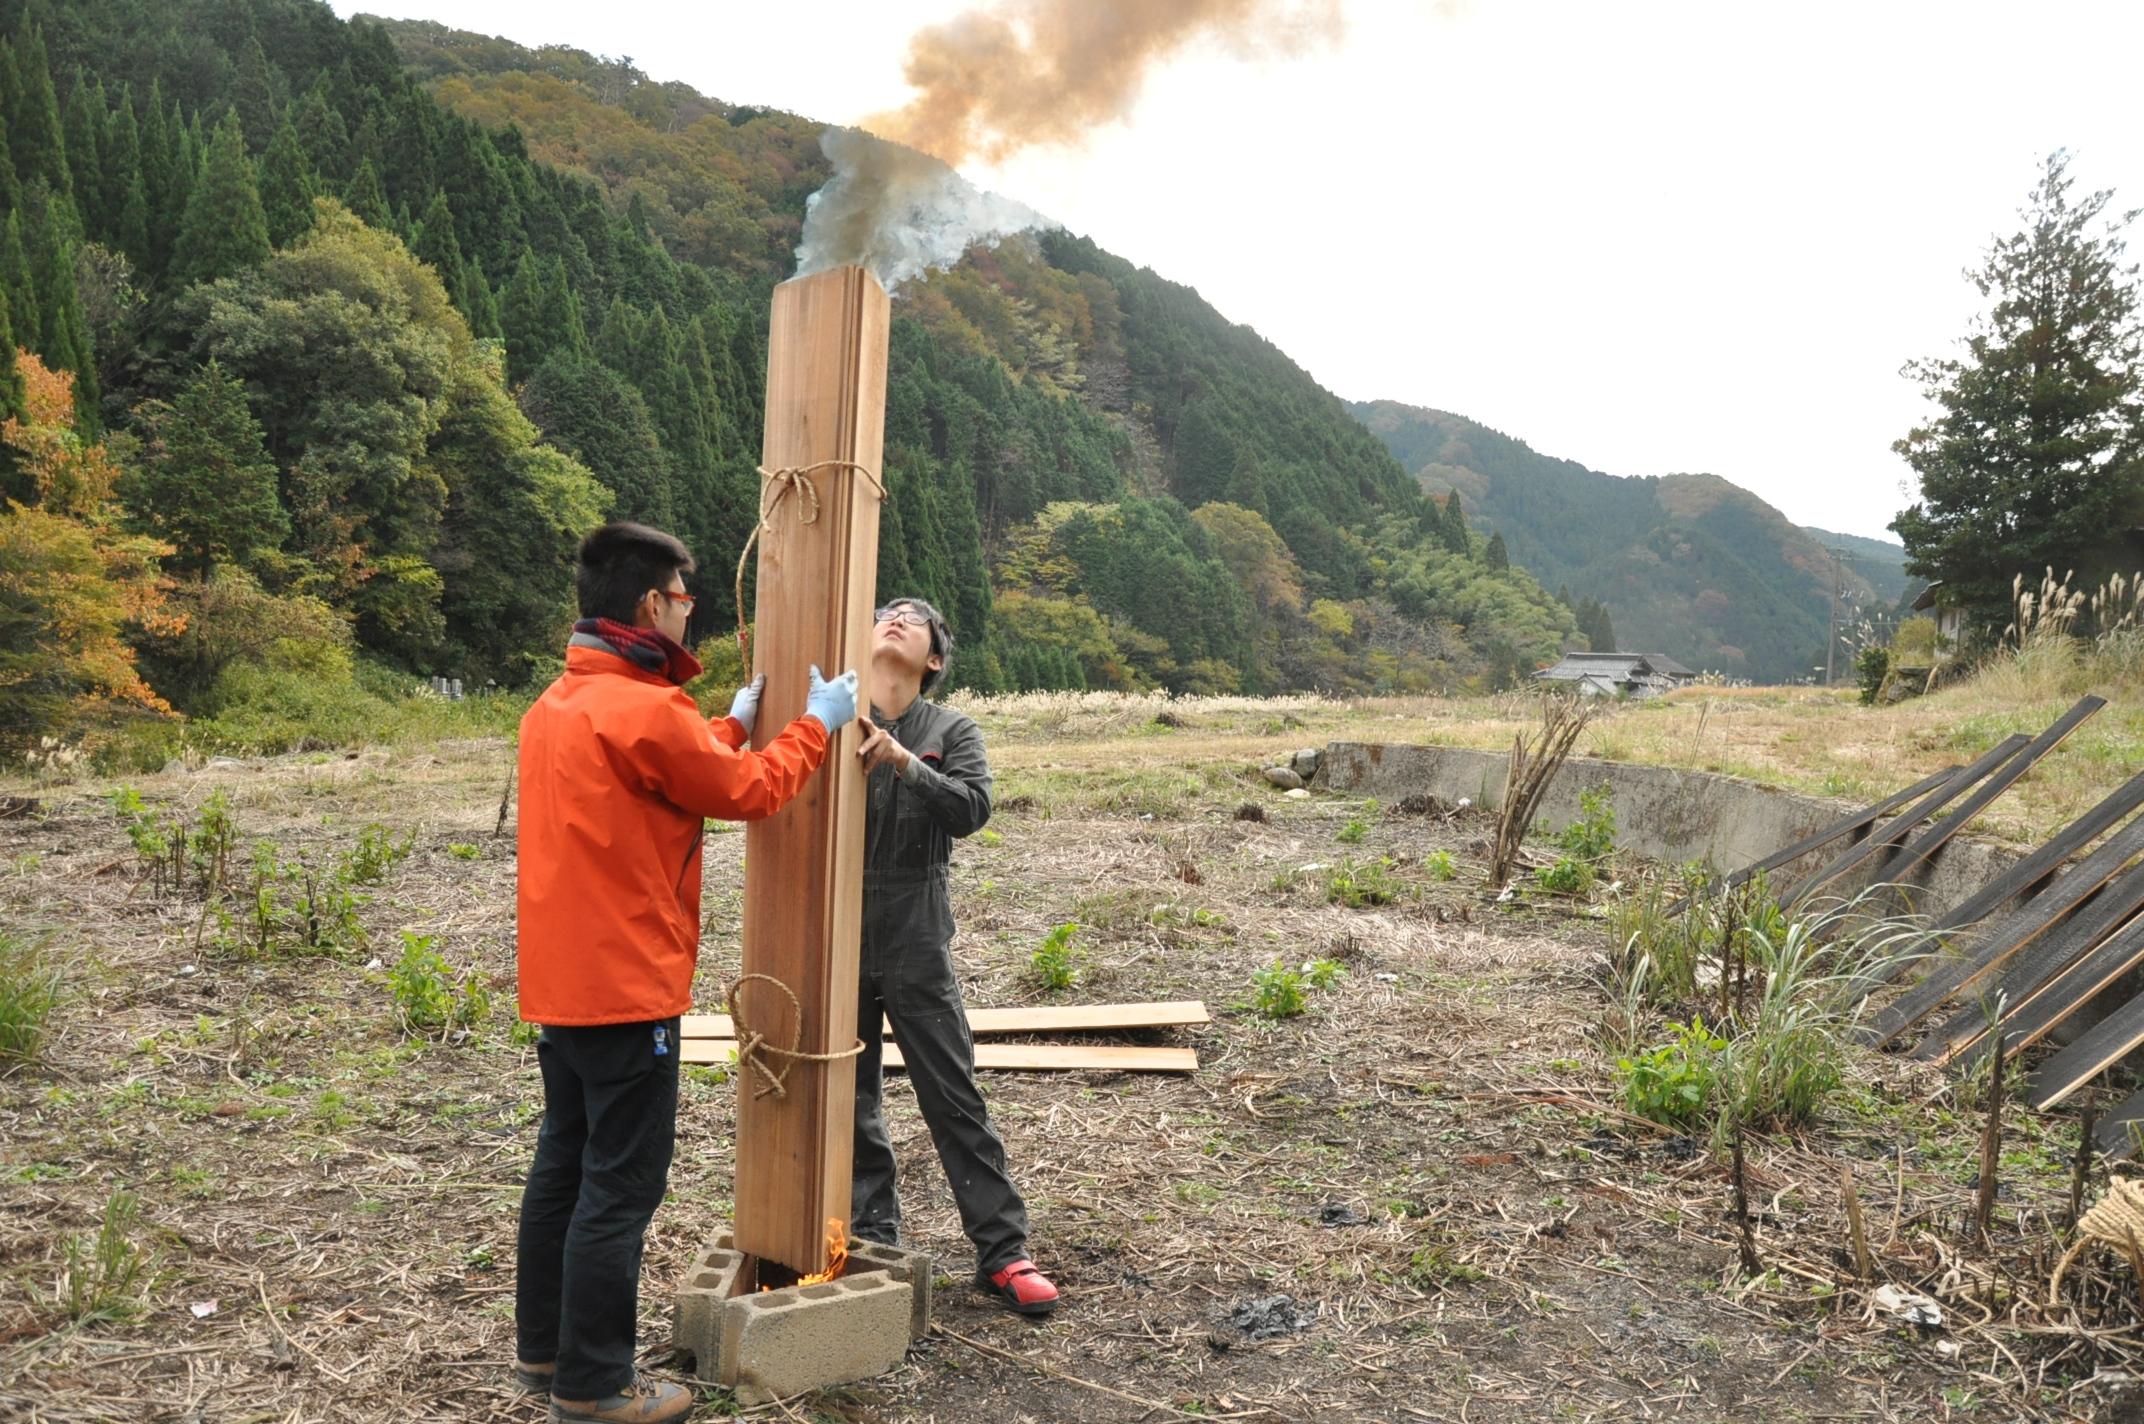 築200年の古民家、焼杉板を焼く!!|古民家再生DIY|煙